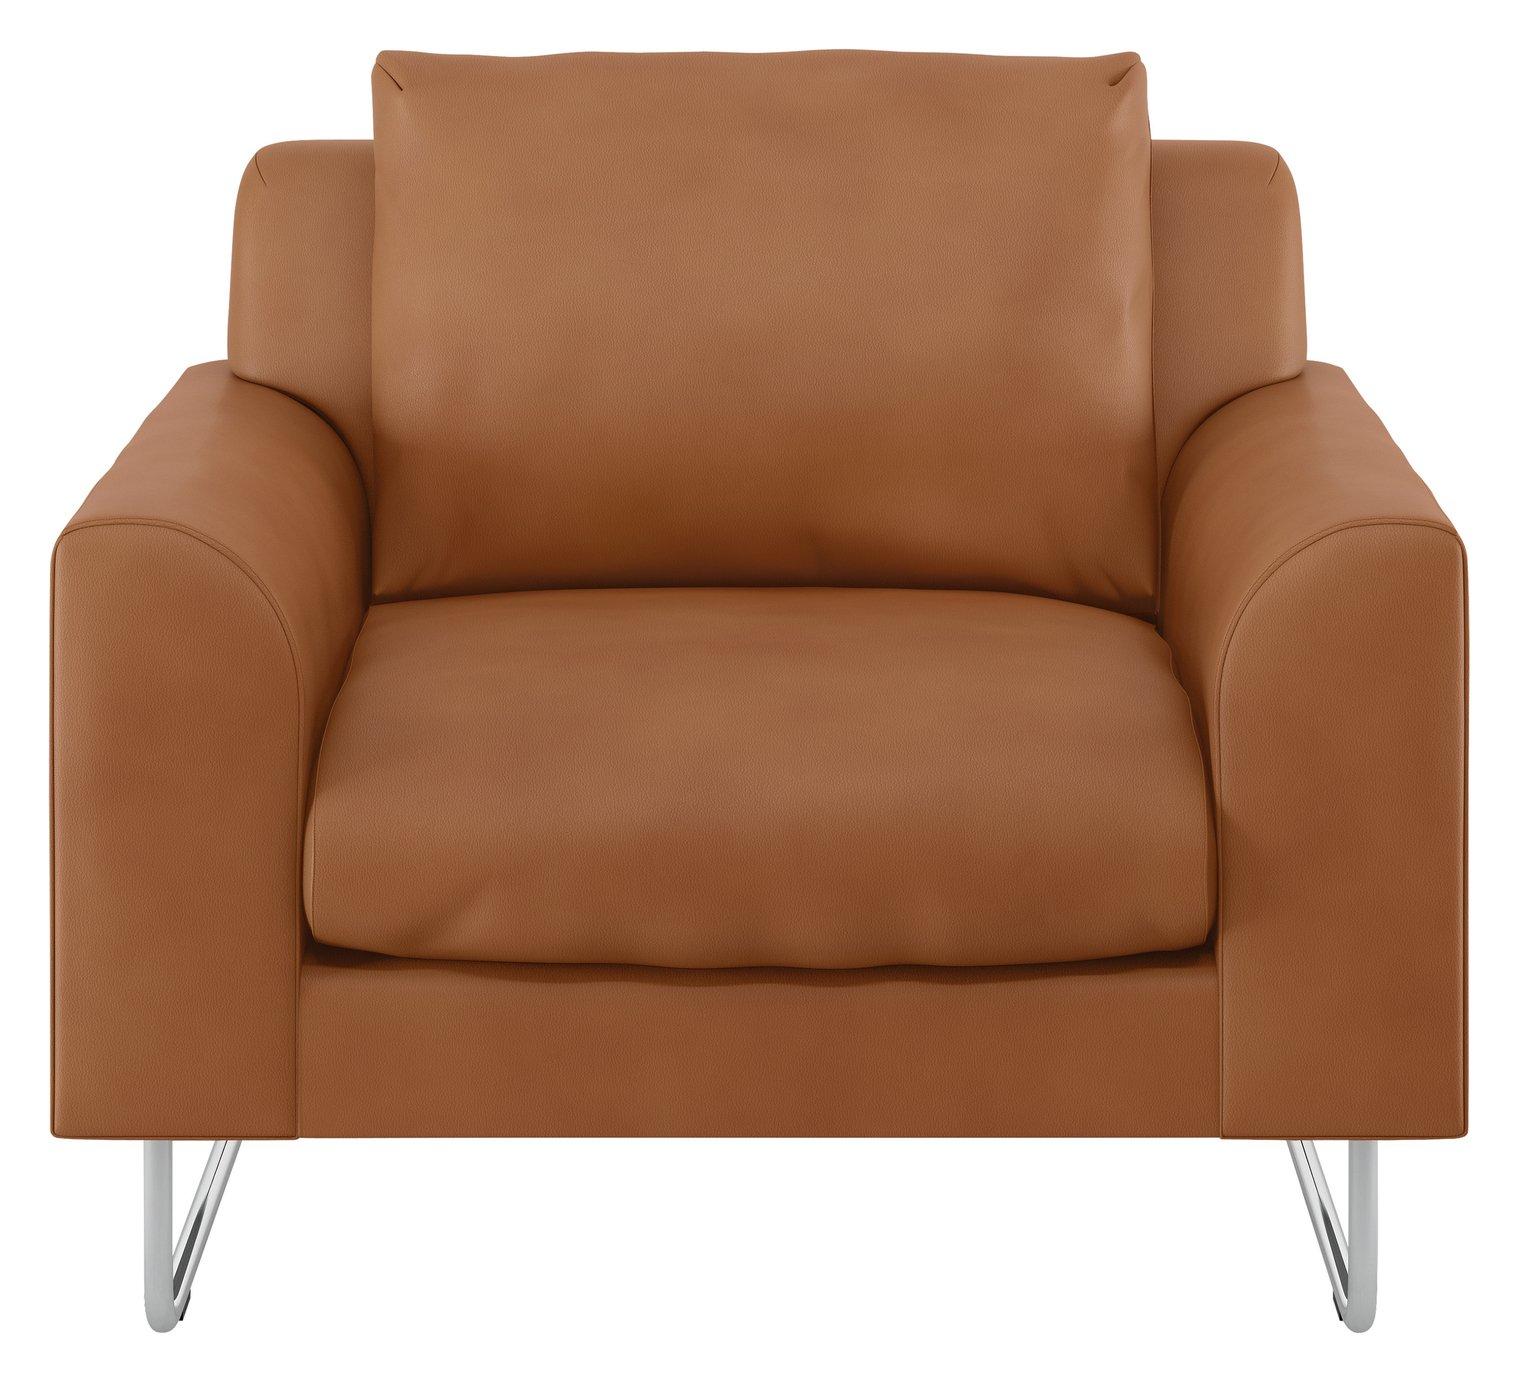 Habitat Lyle Tan Premium Leather Armchair